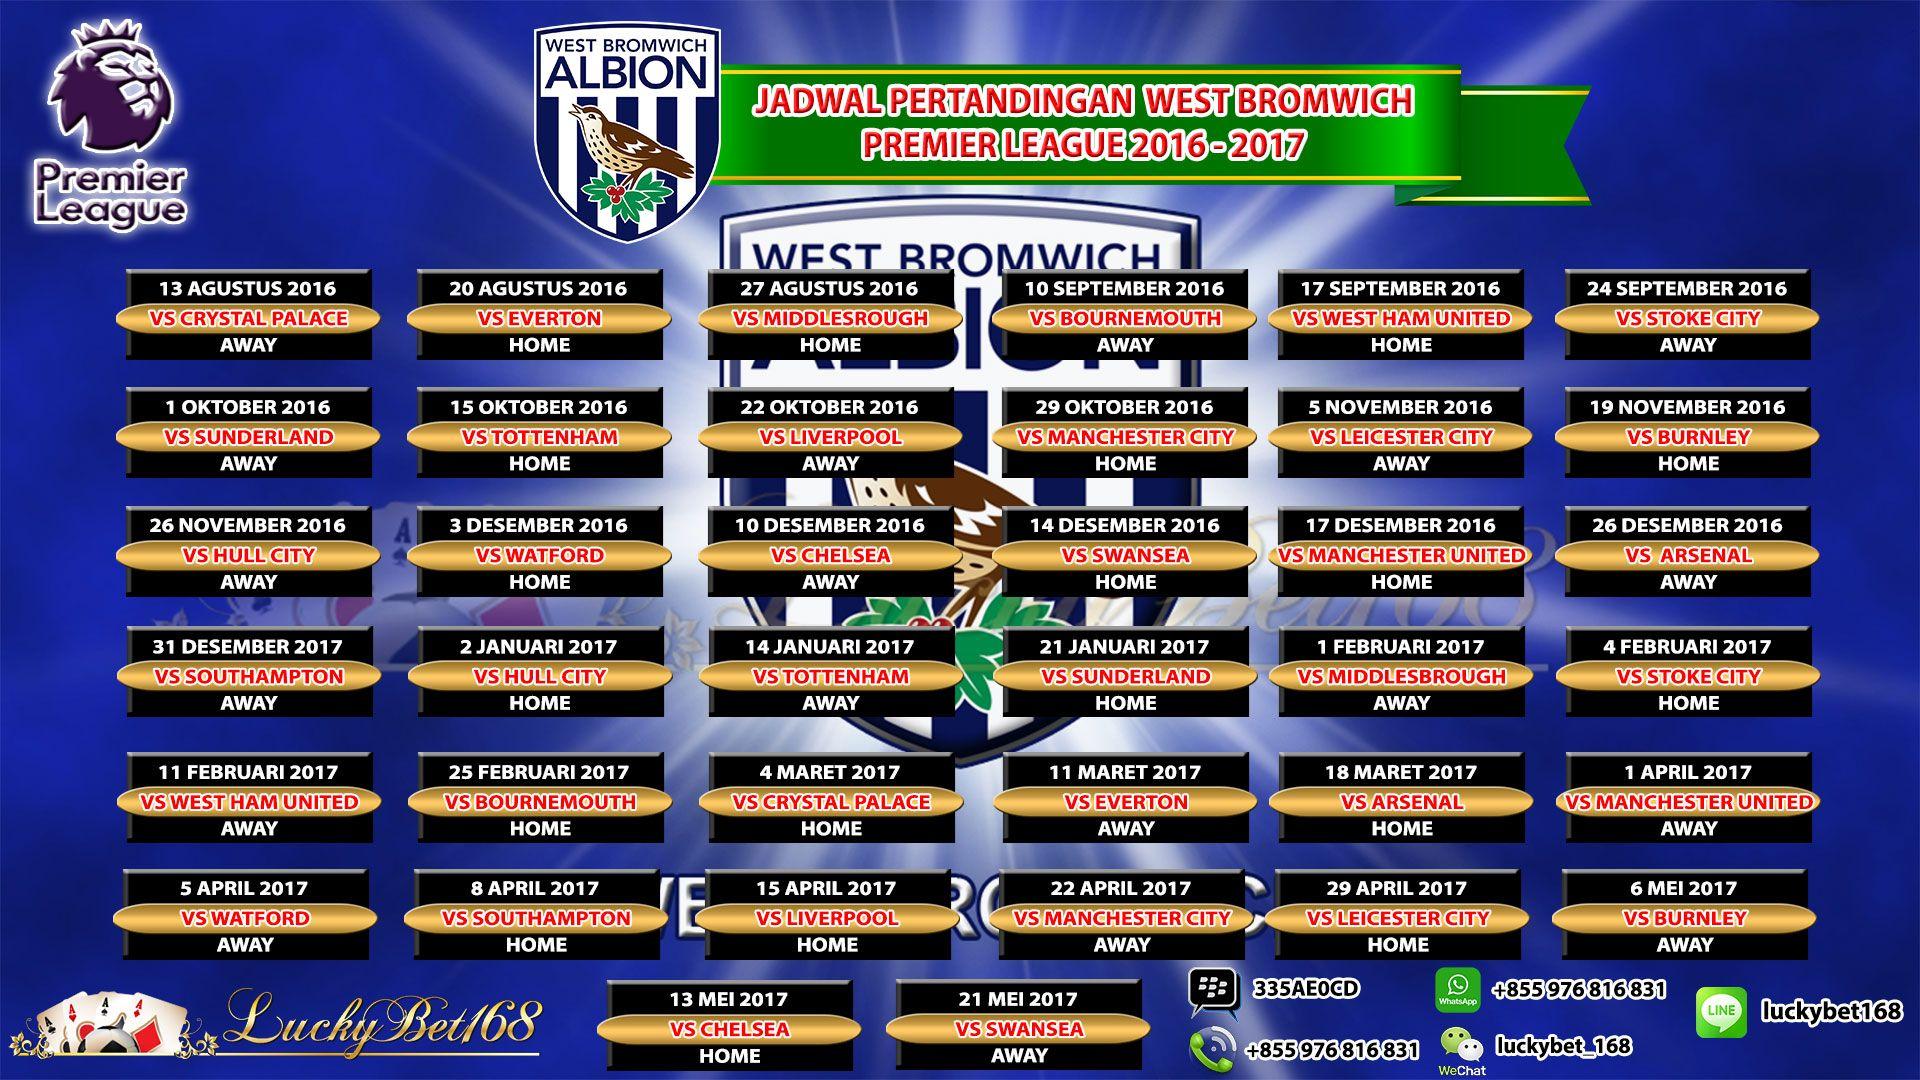 jadwal-west-bromwich-2017.jpg (1920×1080)